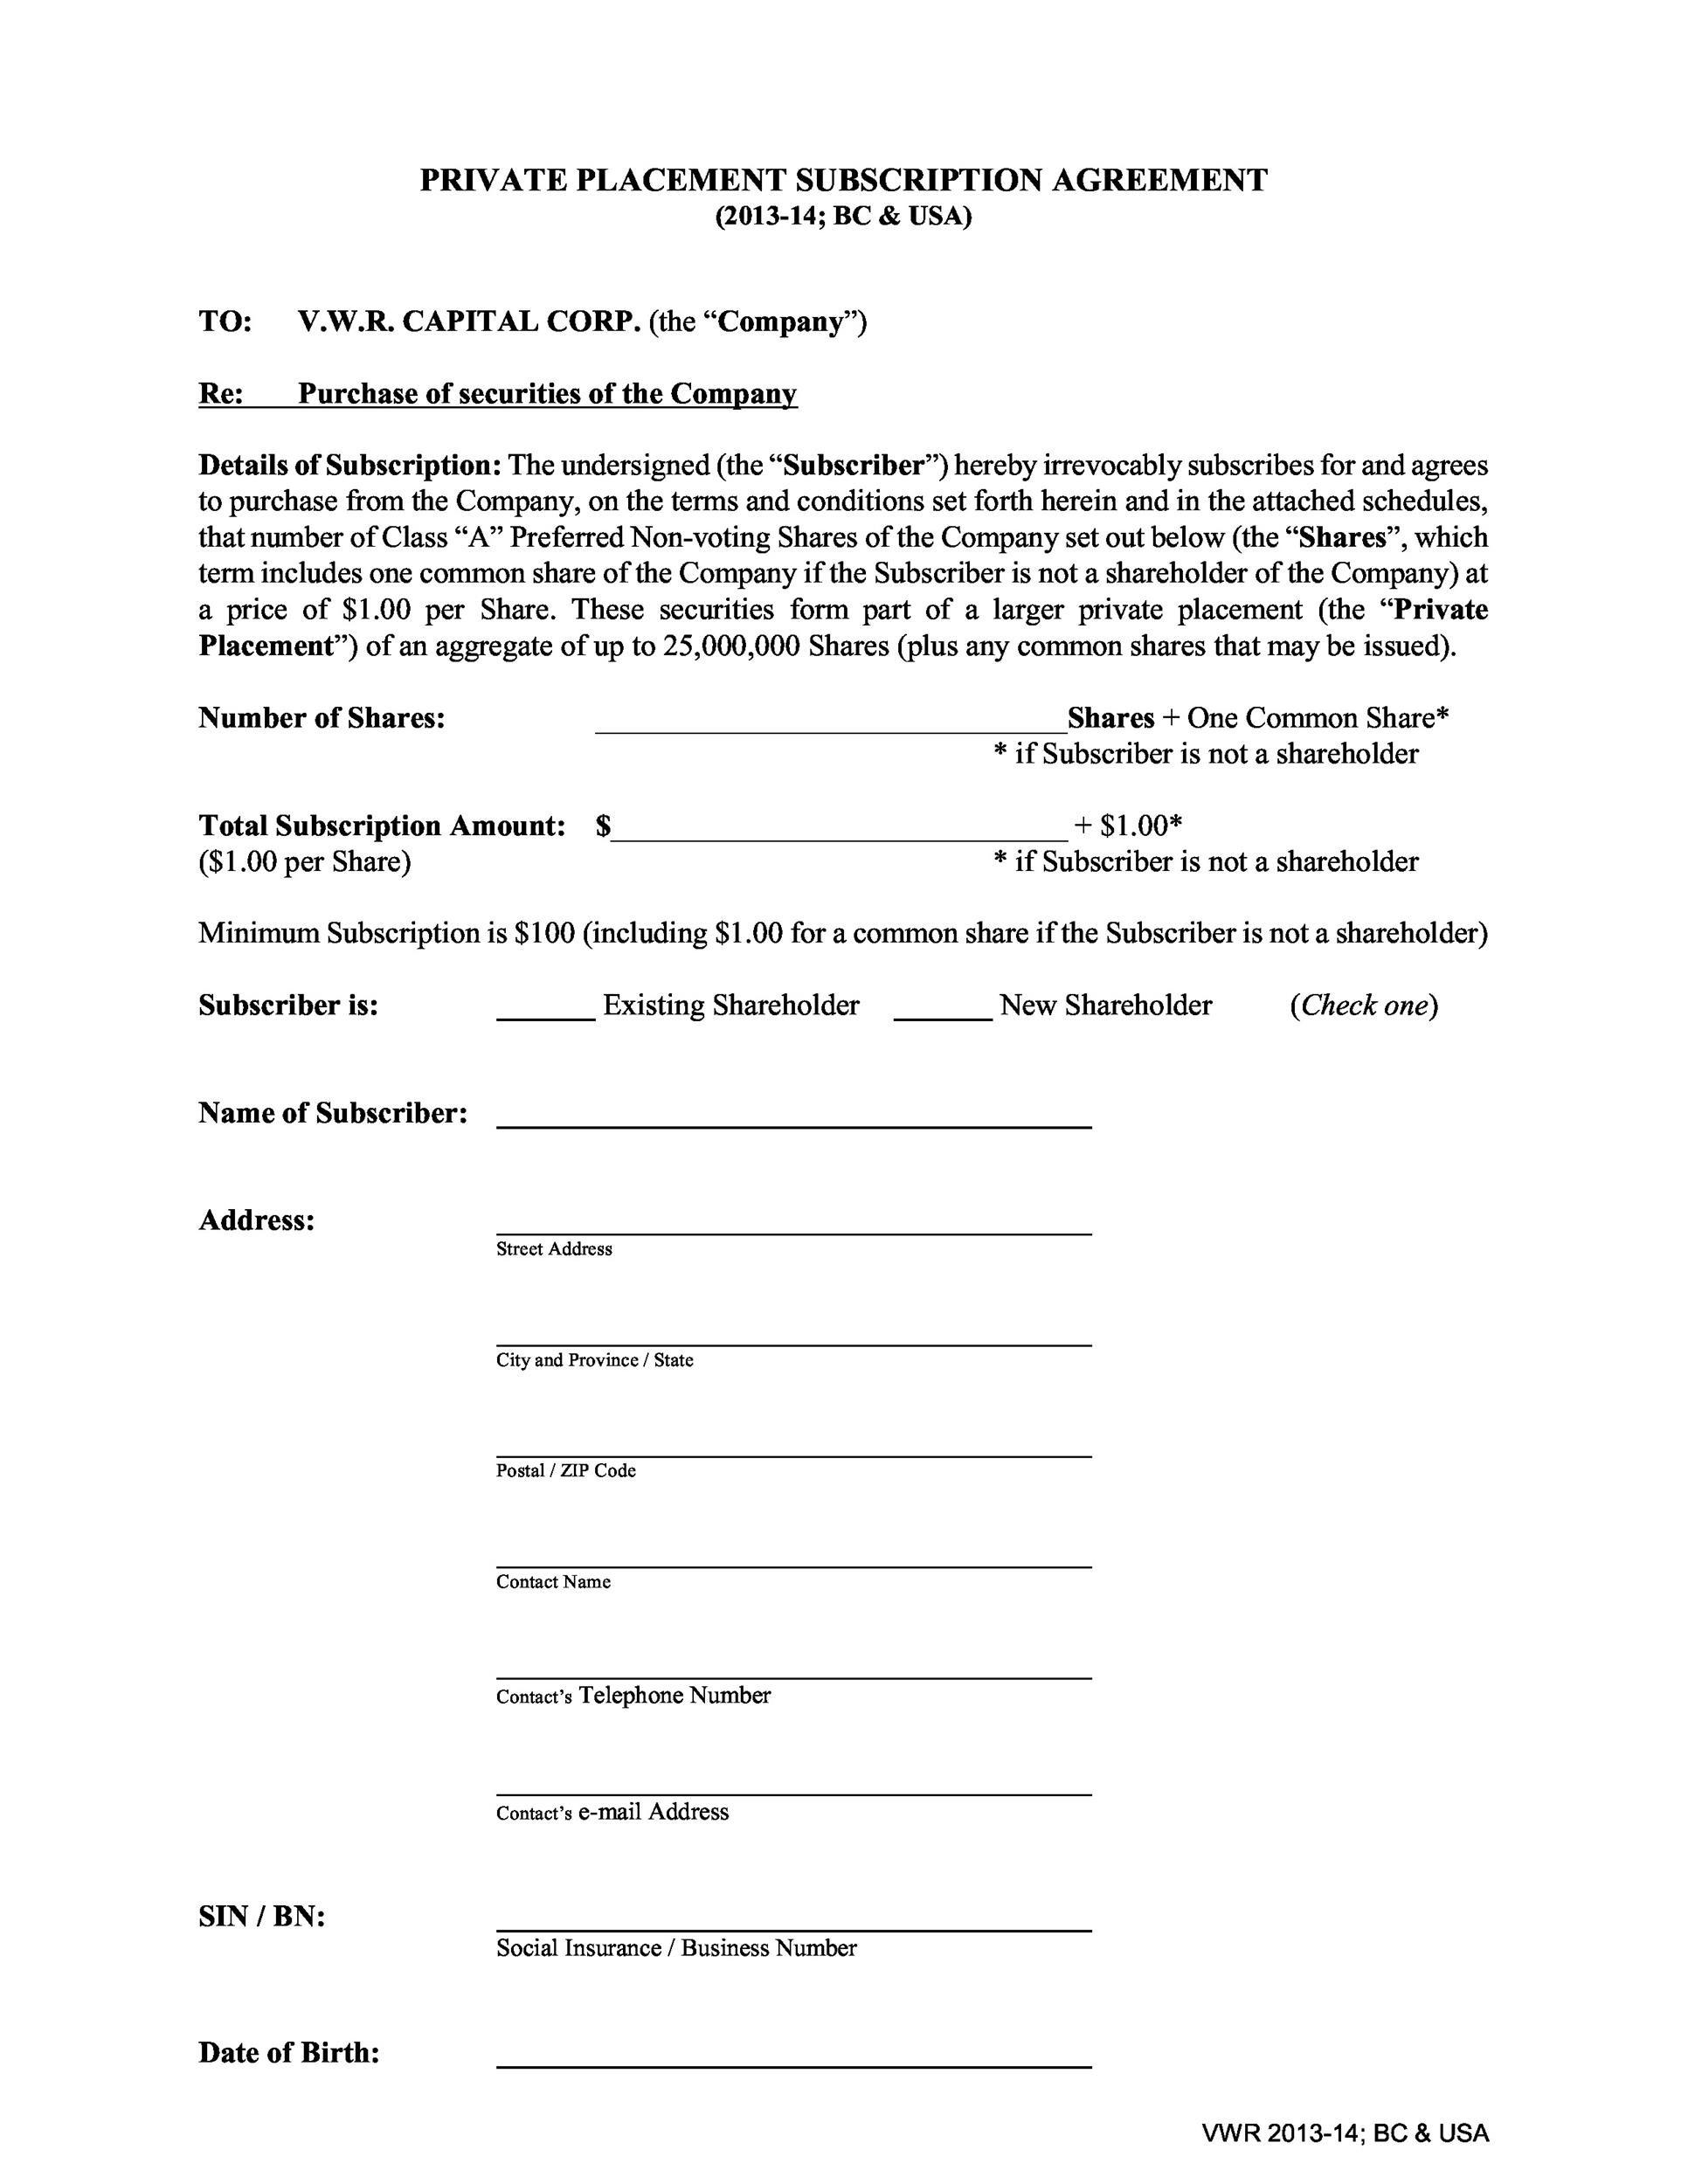 Free private placement memorandum template 18